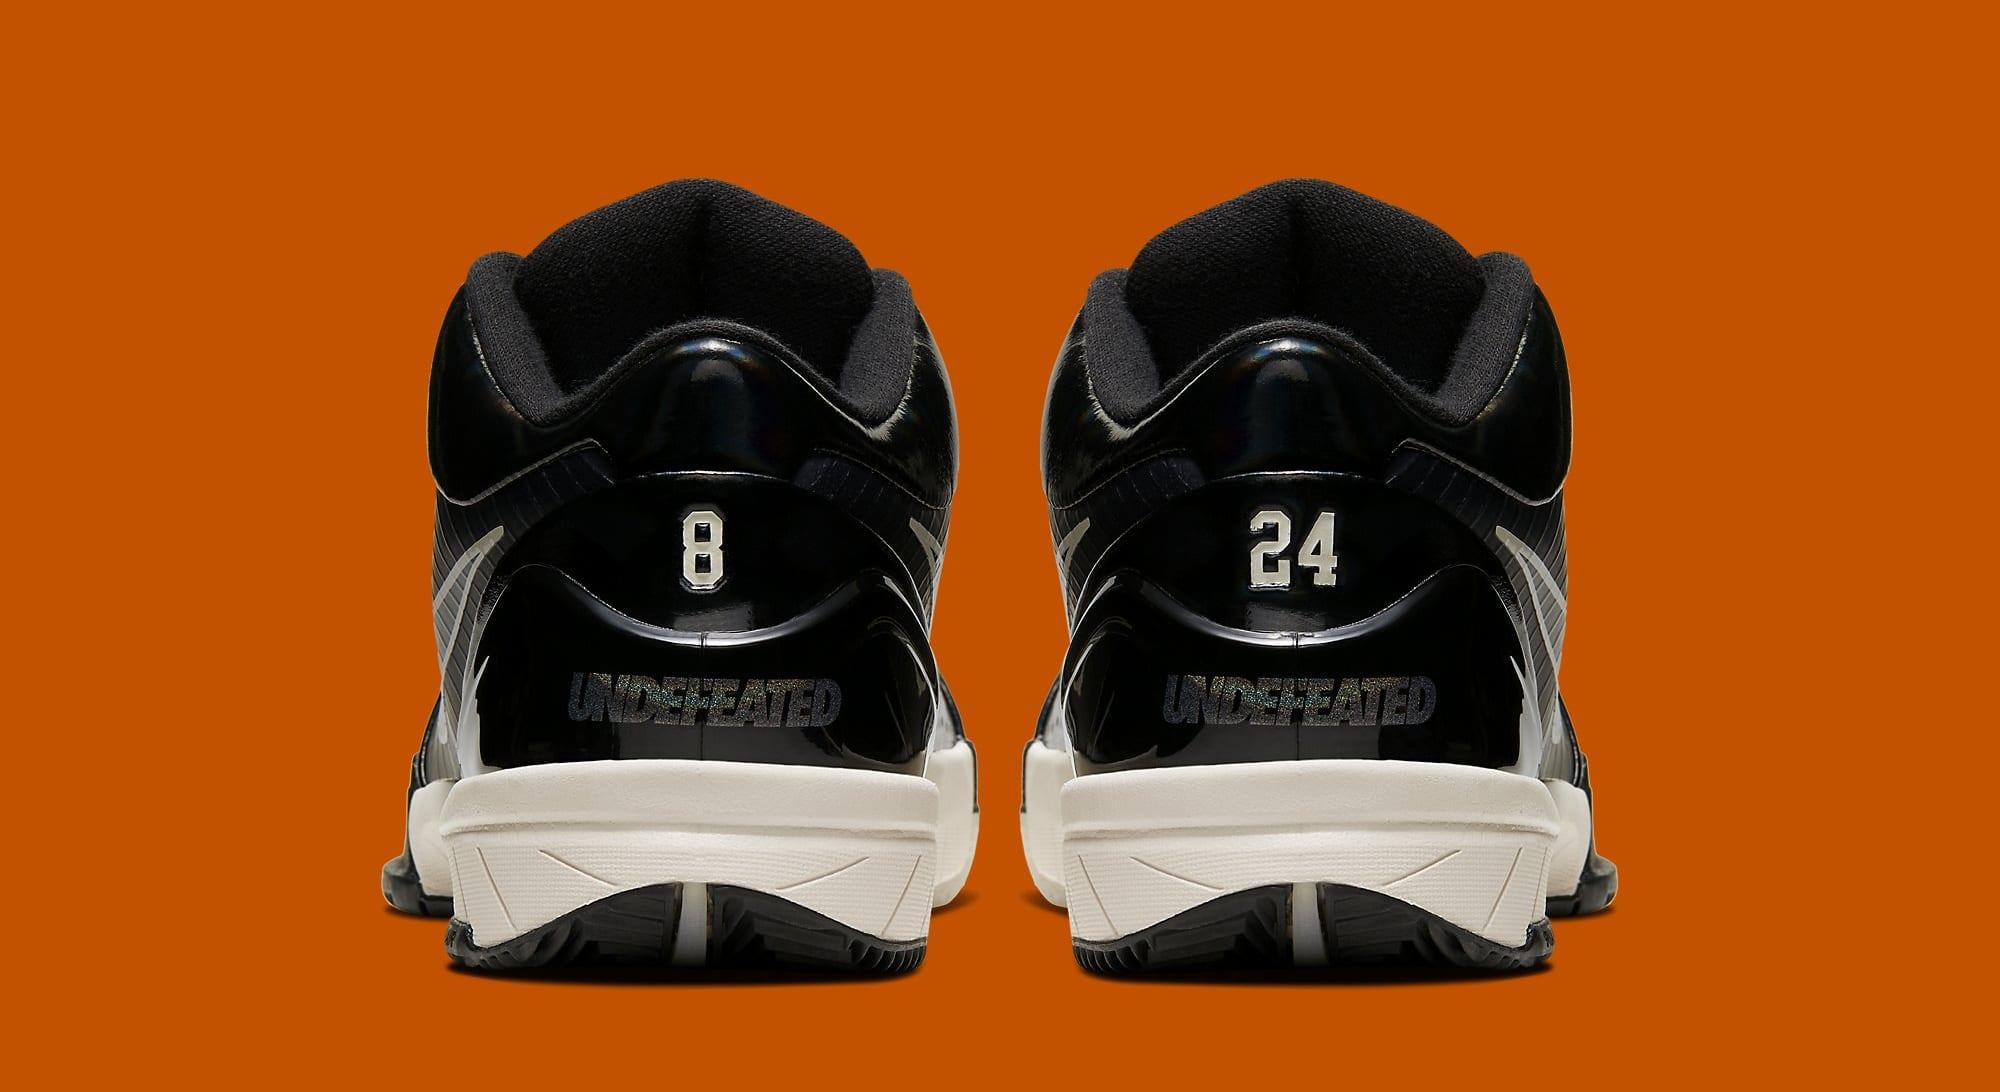 Undefeated x Nike Kobe 4 Protro 'Black Mamba' CQ3869-001 (Heel)